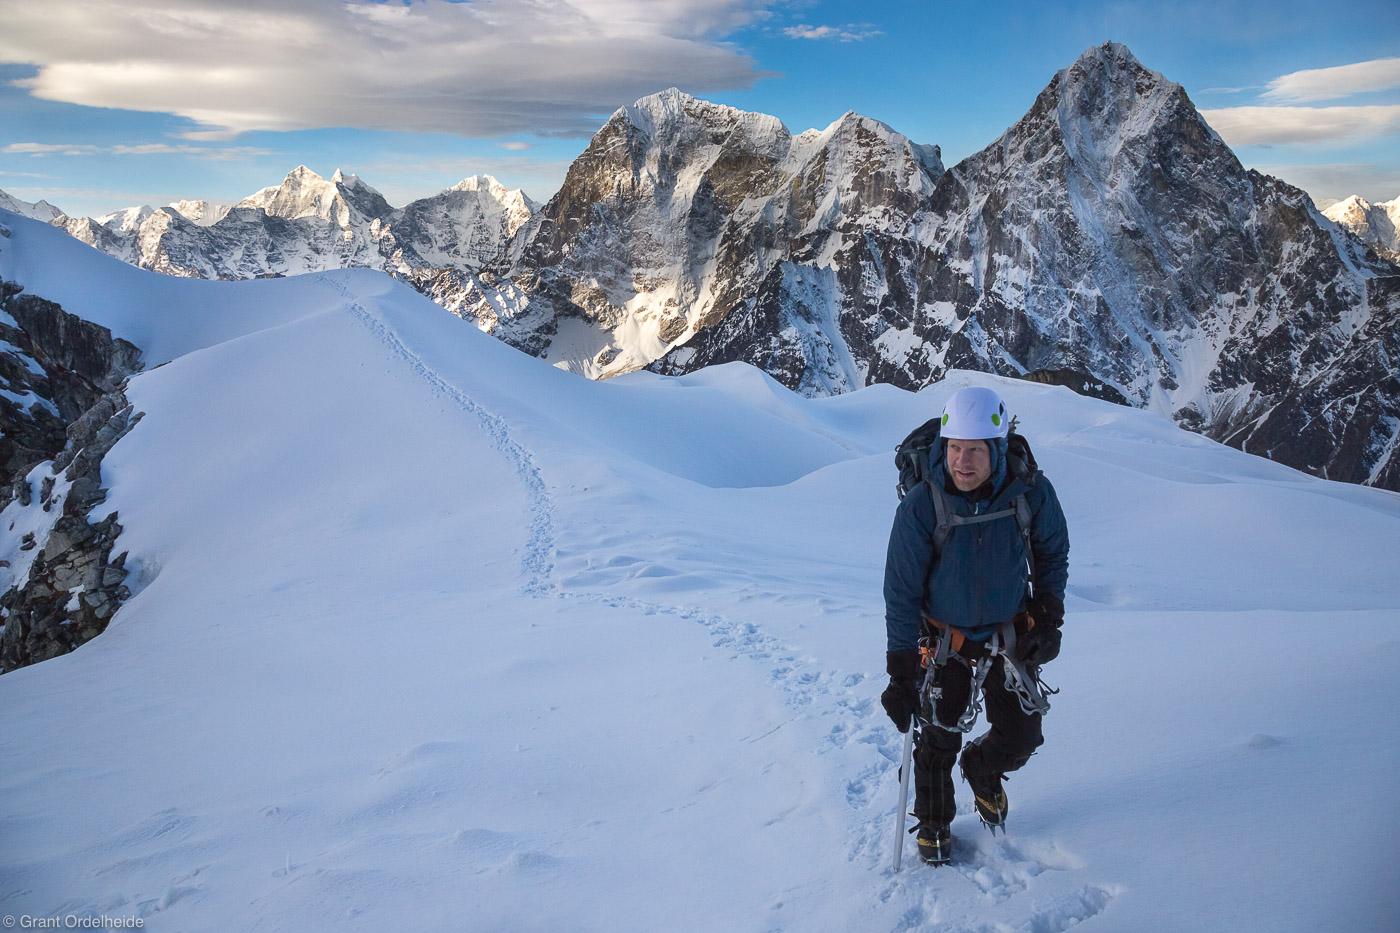 climbing, lobuche, east, sagarmatha, national, park, himalaya, nepal, nate kay, high, taboche, cholatse, background, photo